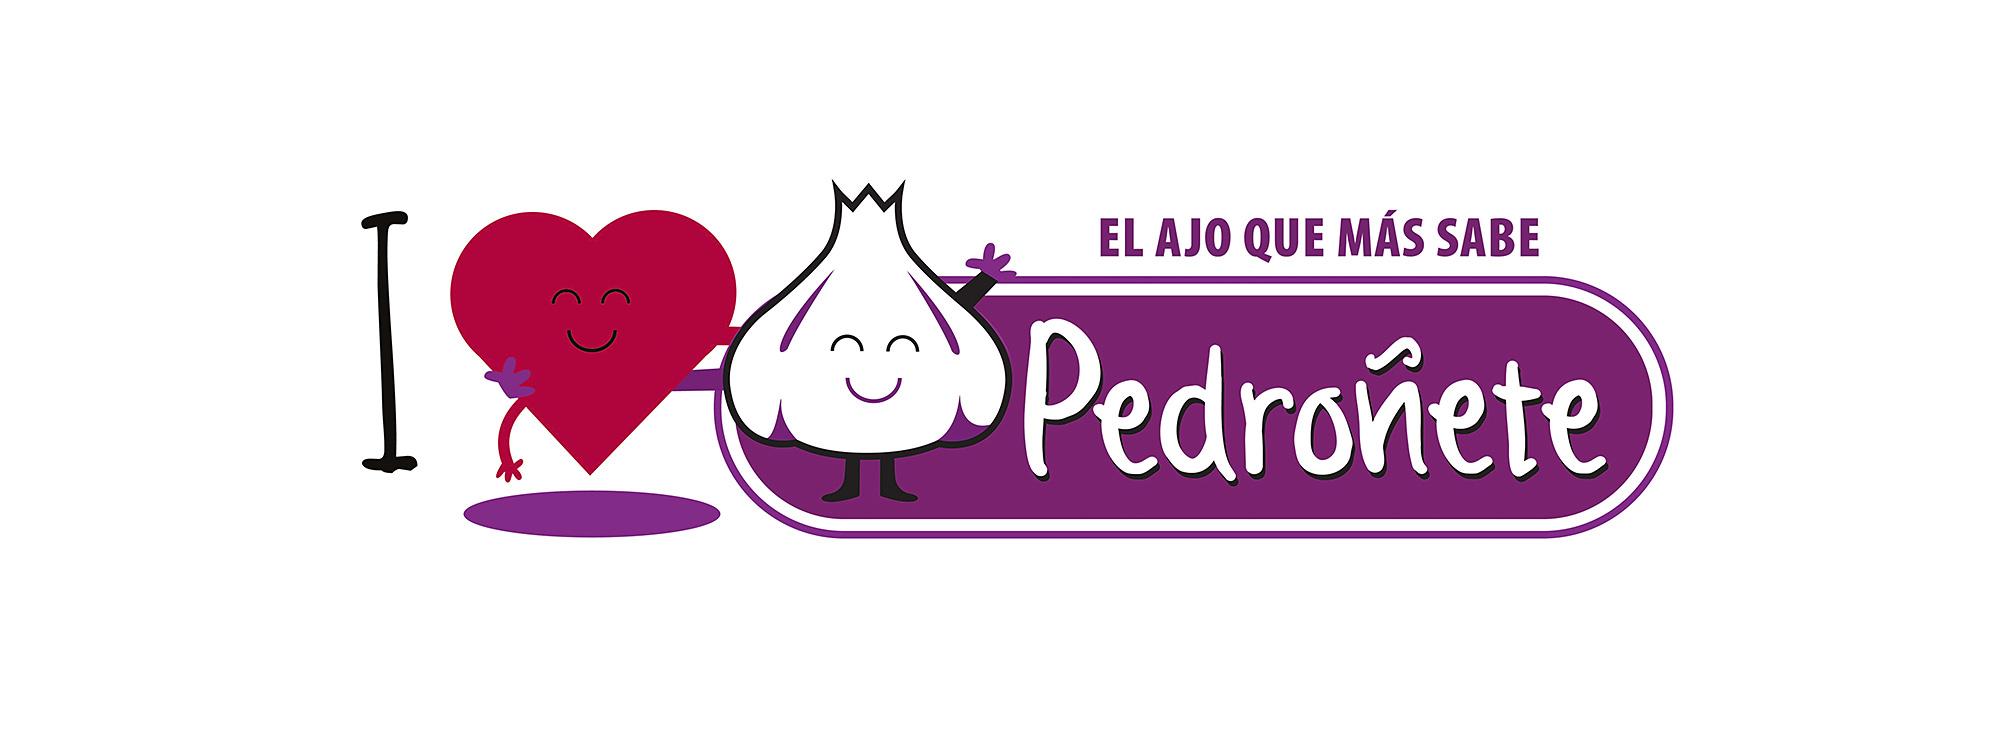 Diseño web albacete, Redes Sociales, Albacete, imprenta Albacete y fotografia publicitaria, Pedroñete